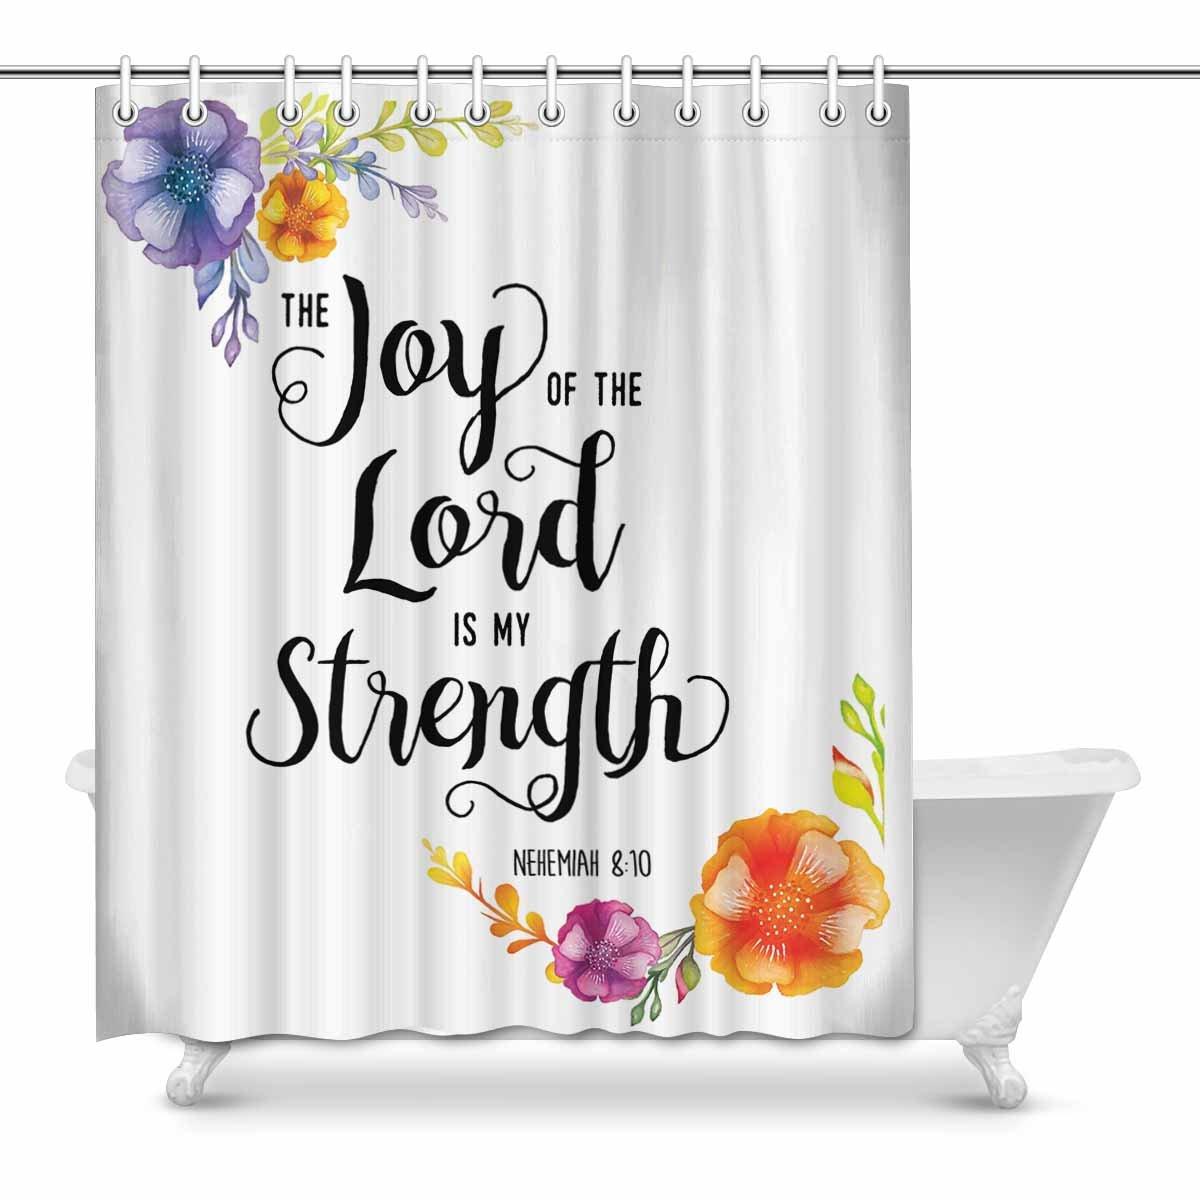 mkhert religious christian bible verse joy of the lord waterproof shower curtain decor fabric bathroom set 60x72 inch walmart com